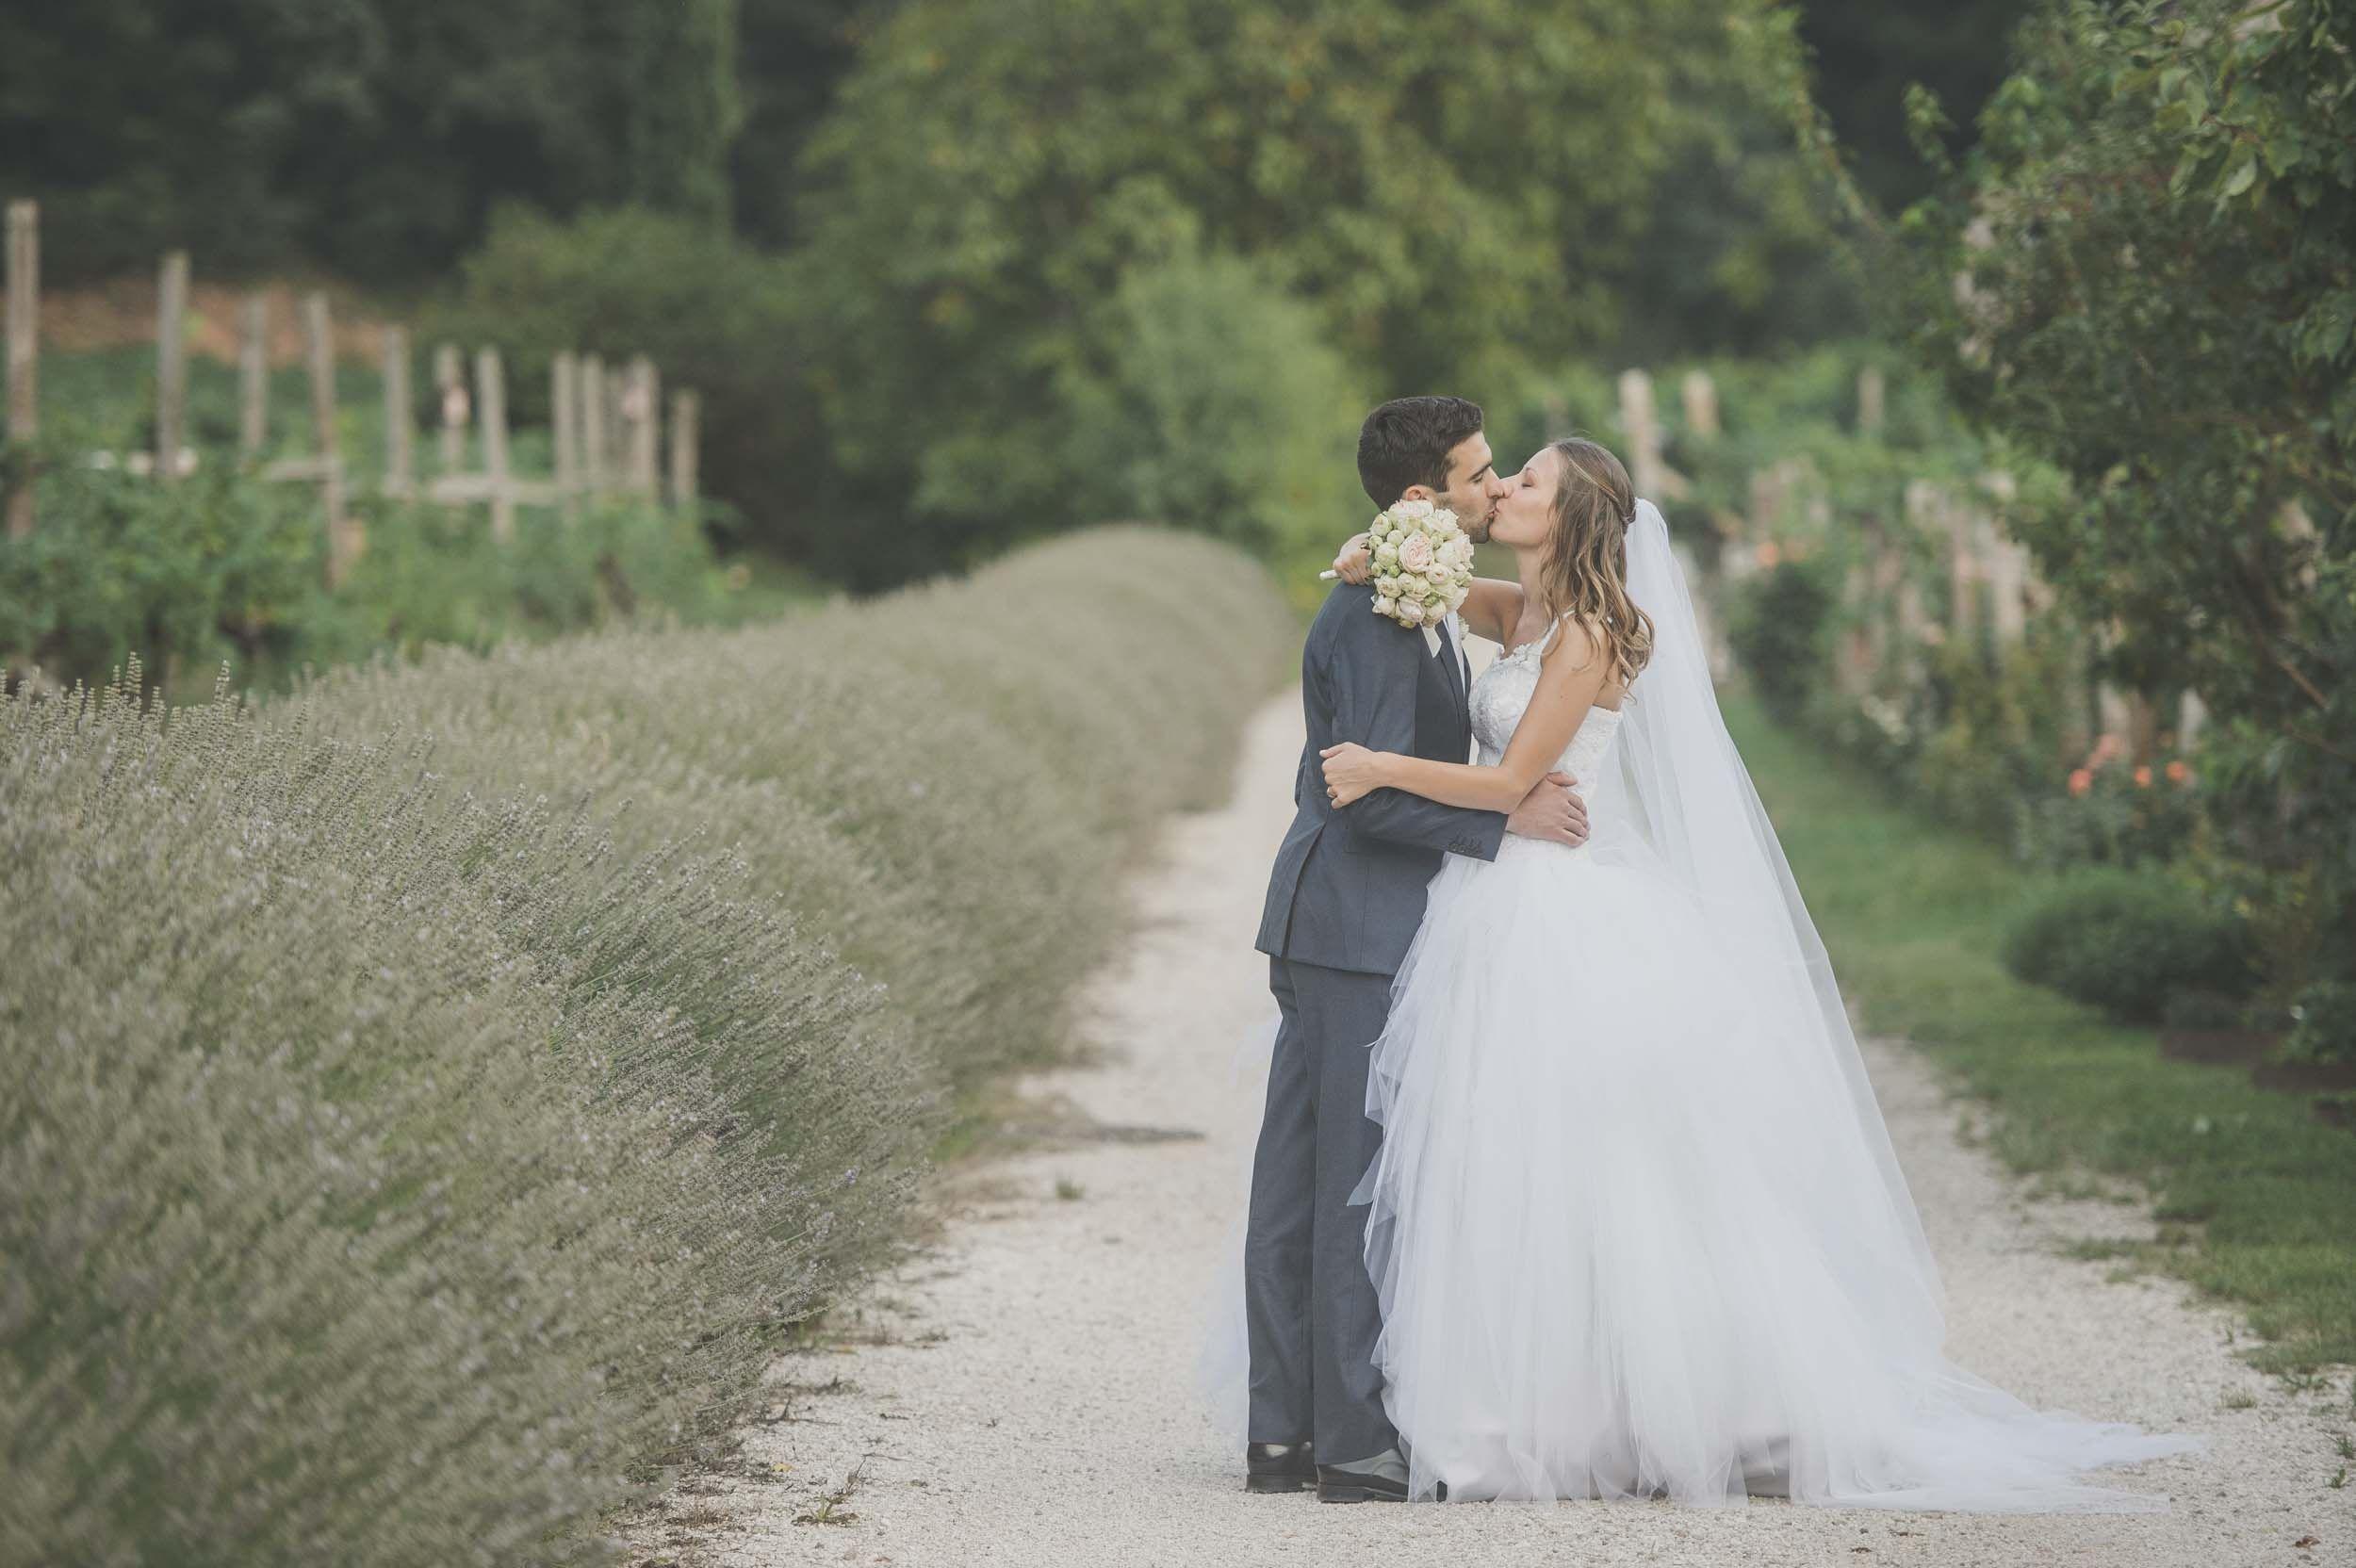 Matrimonio Alle Cantine Endrizzi Wedding In Italy Www Weddingintino